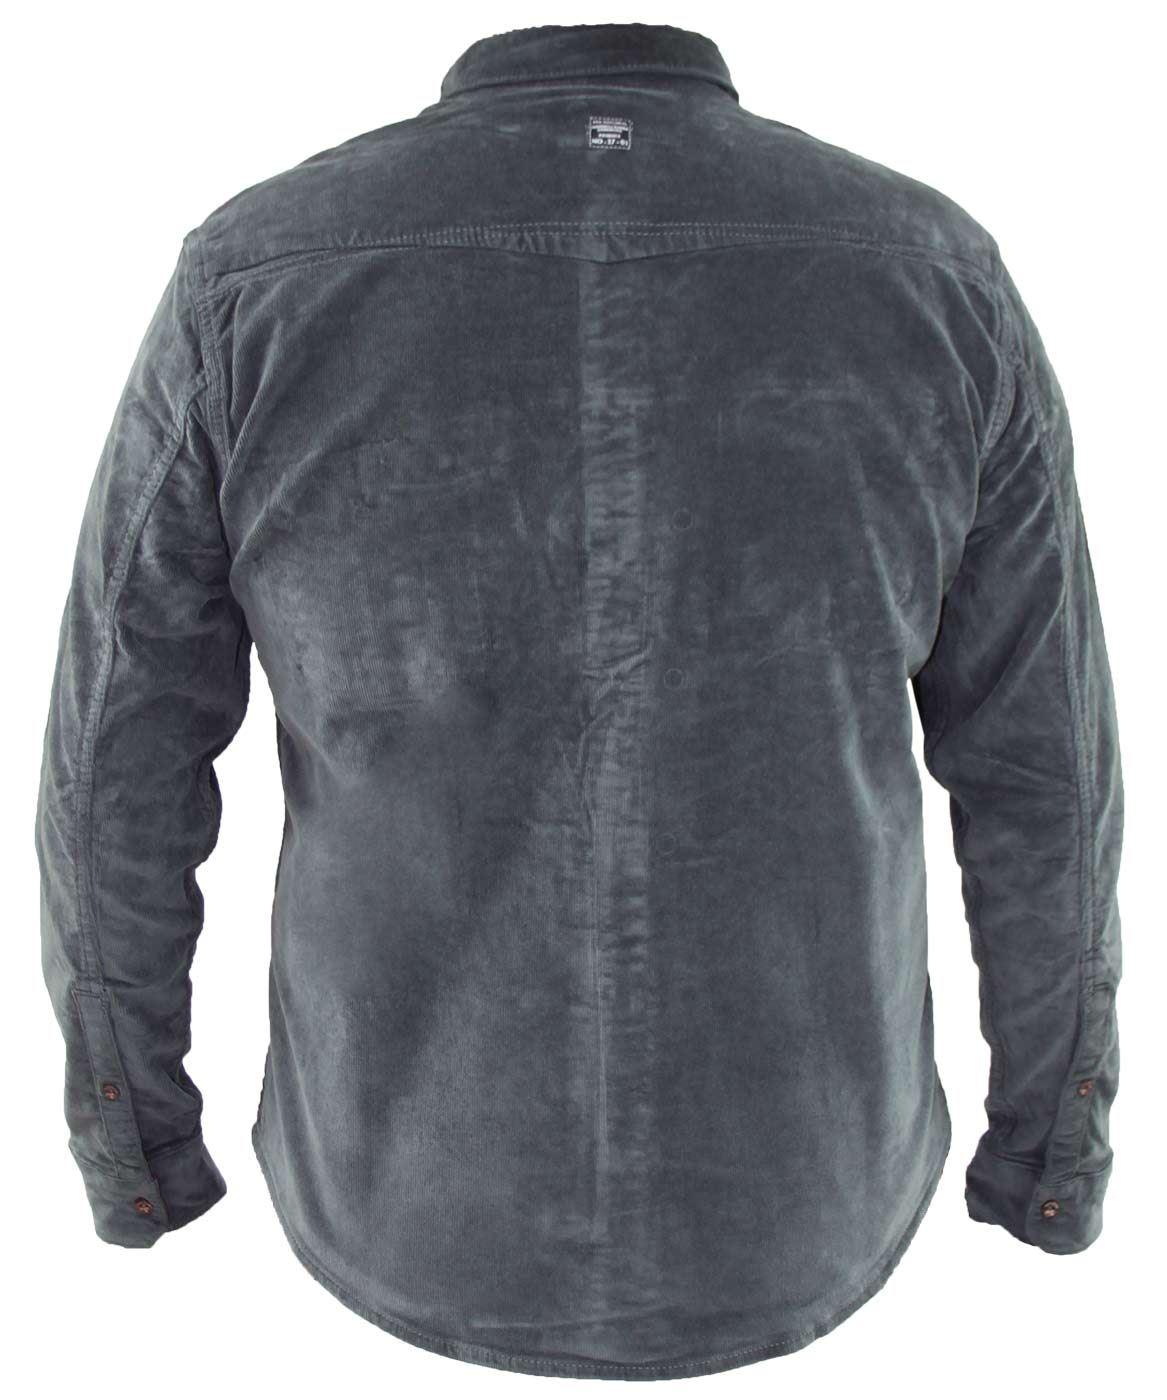 Mens-Corduroy-Cotton-Shirt-Long-Sleeve-Casual-Shirts-Jacksouth-Jacket-Top-S-2XL thumbnail 24